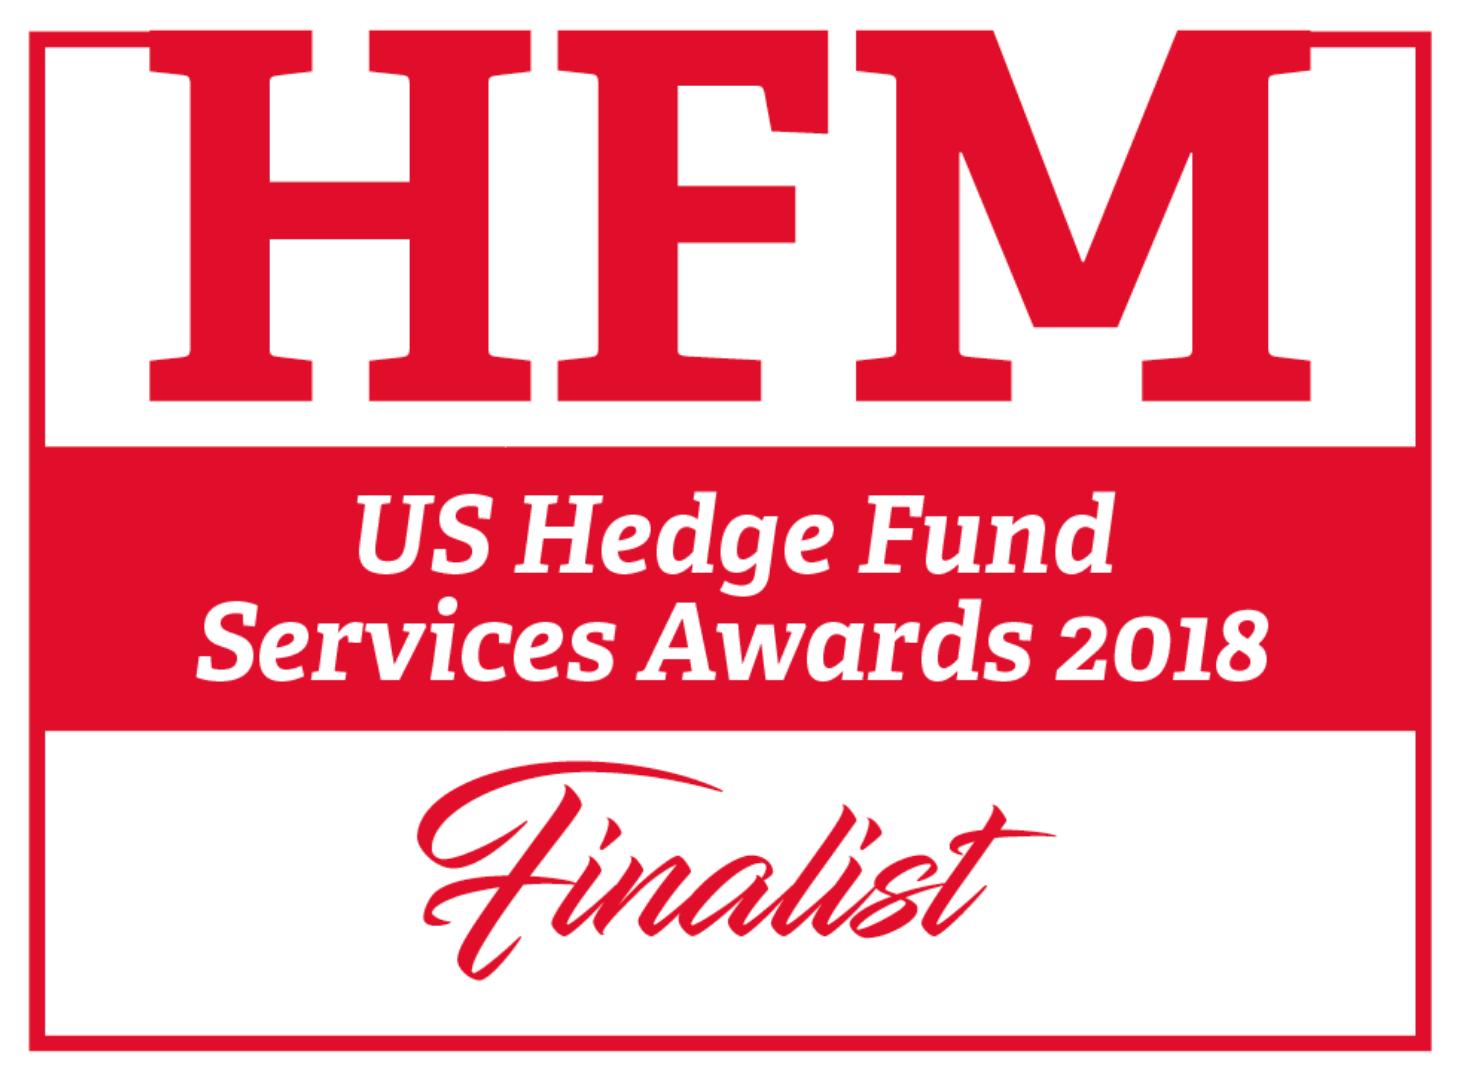 HFM Award Finalist 2018